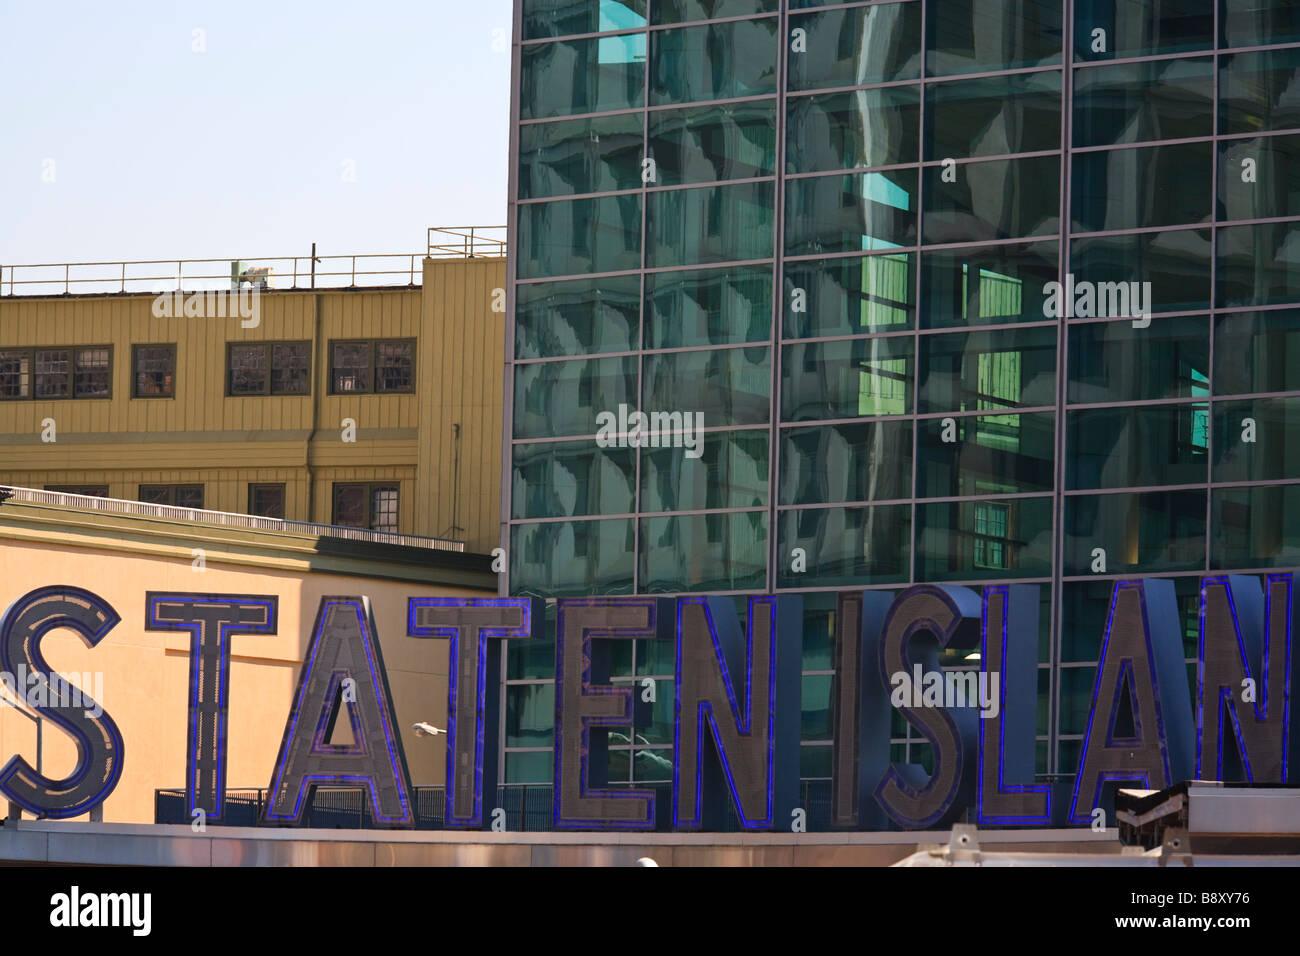 Staten Island Ferry Terminal Battery Park Lower Manhattan New York NY - Stock Image